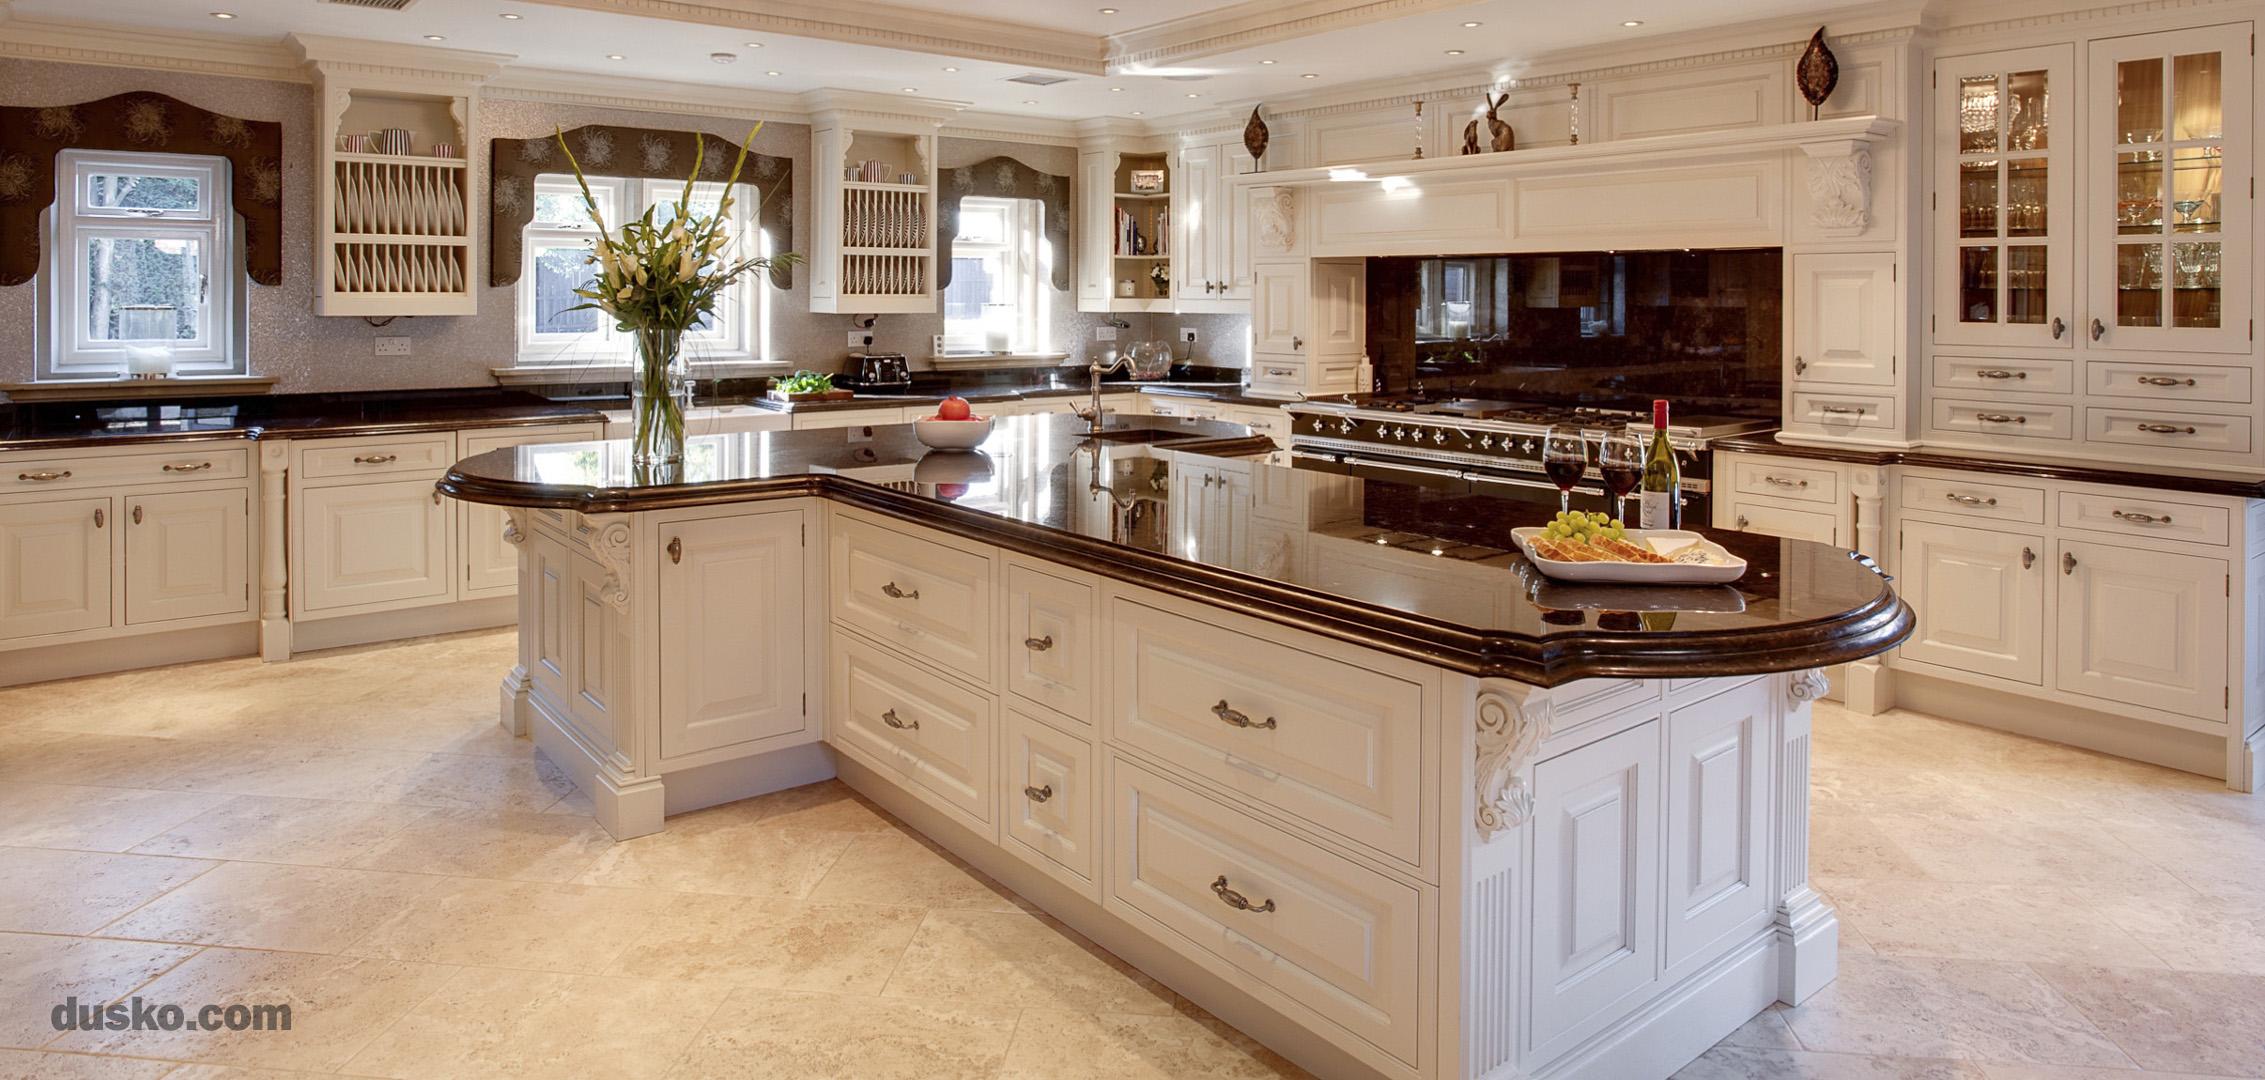 Colonial Style Kitchen in Prestbury, Cheshire